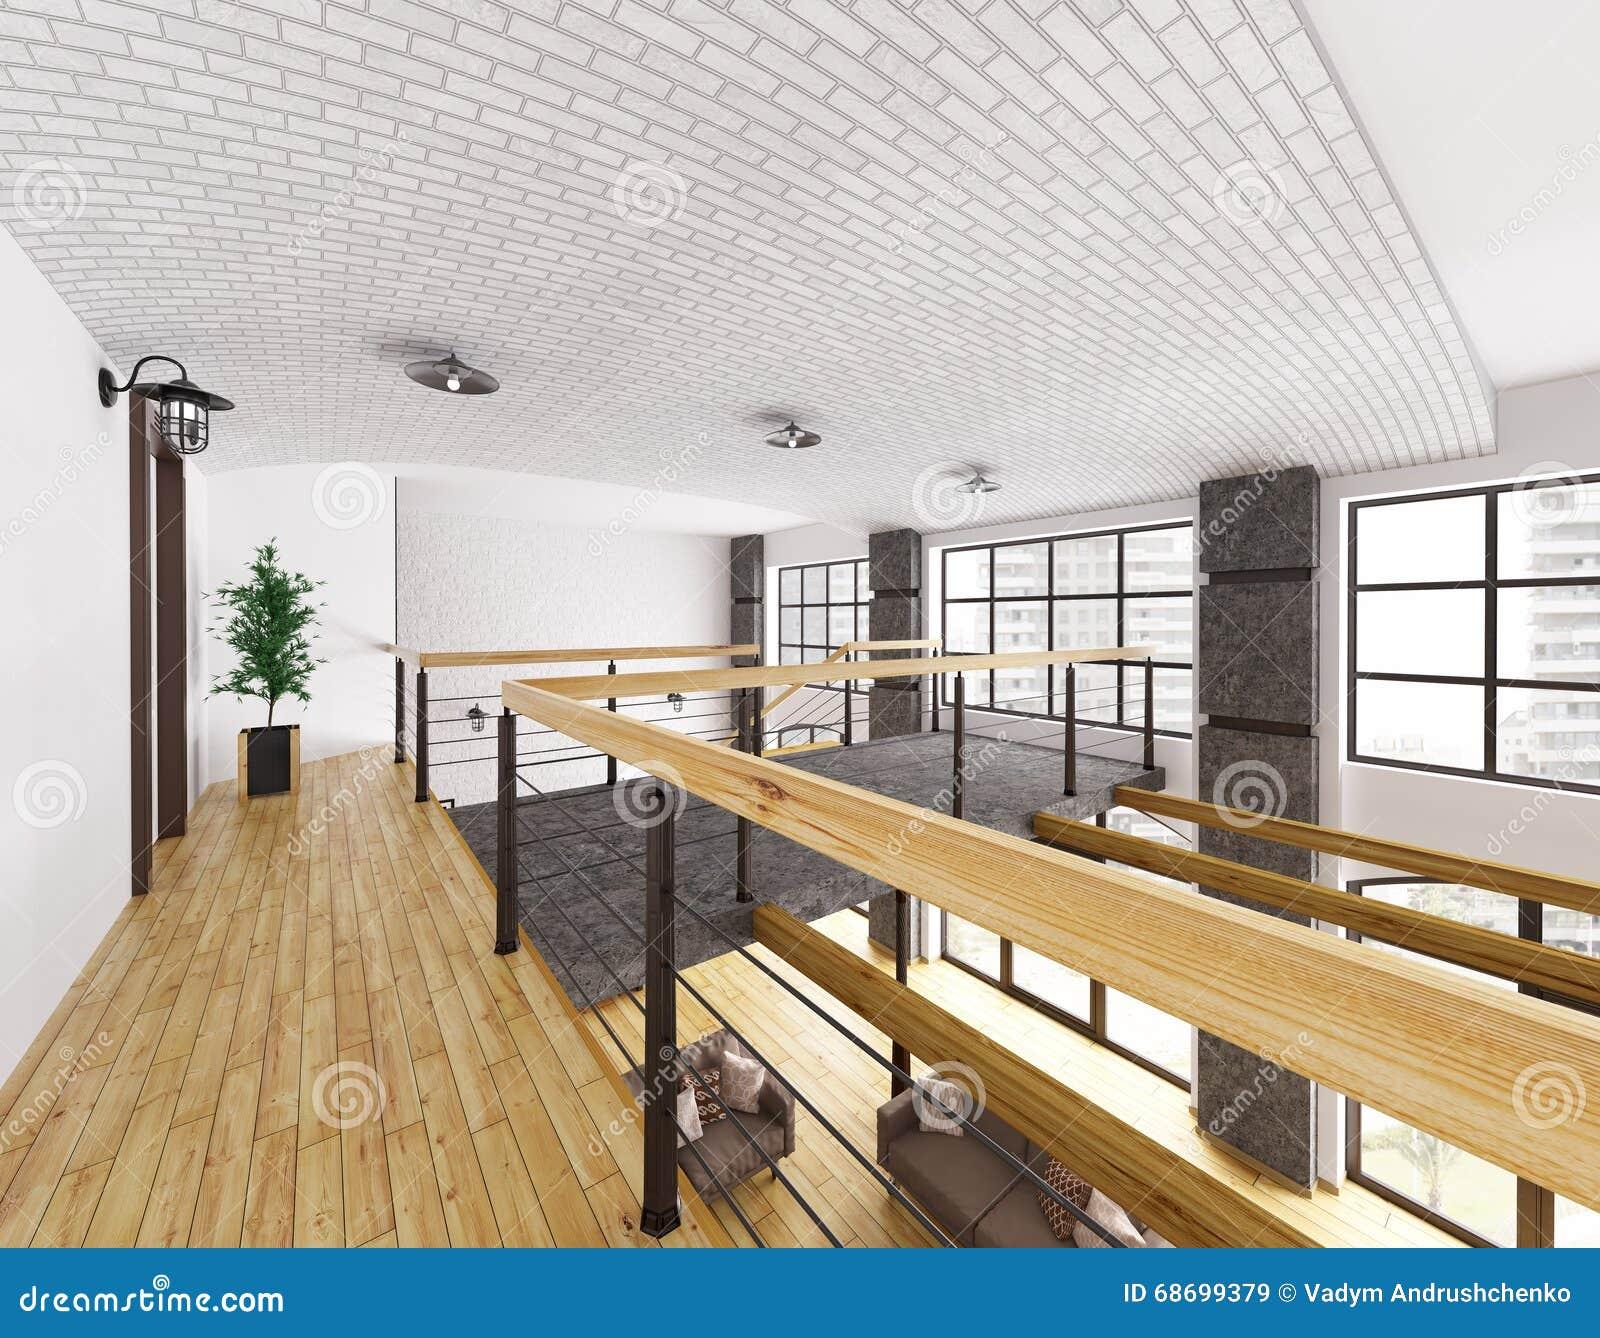 Interior Of Second Floor Of Loft House 3d Render Stock